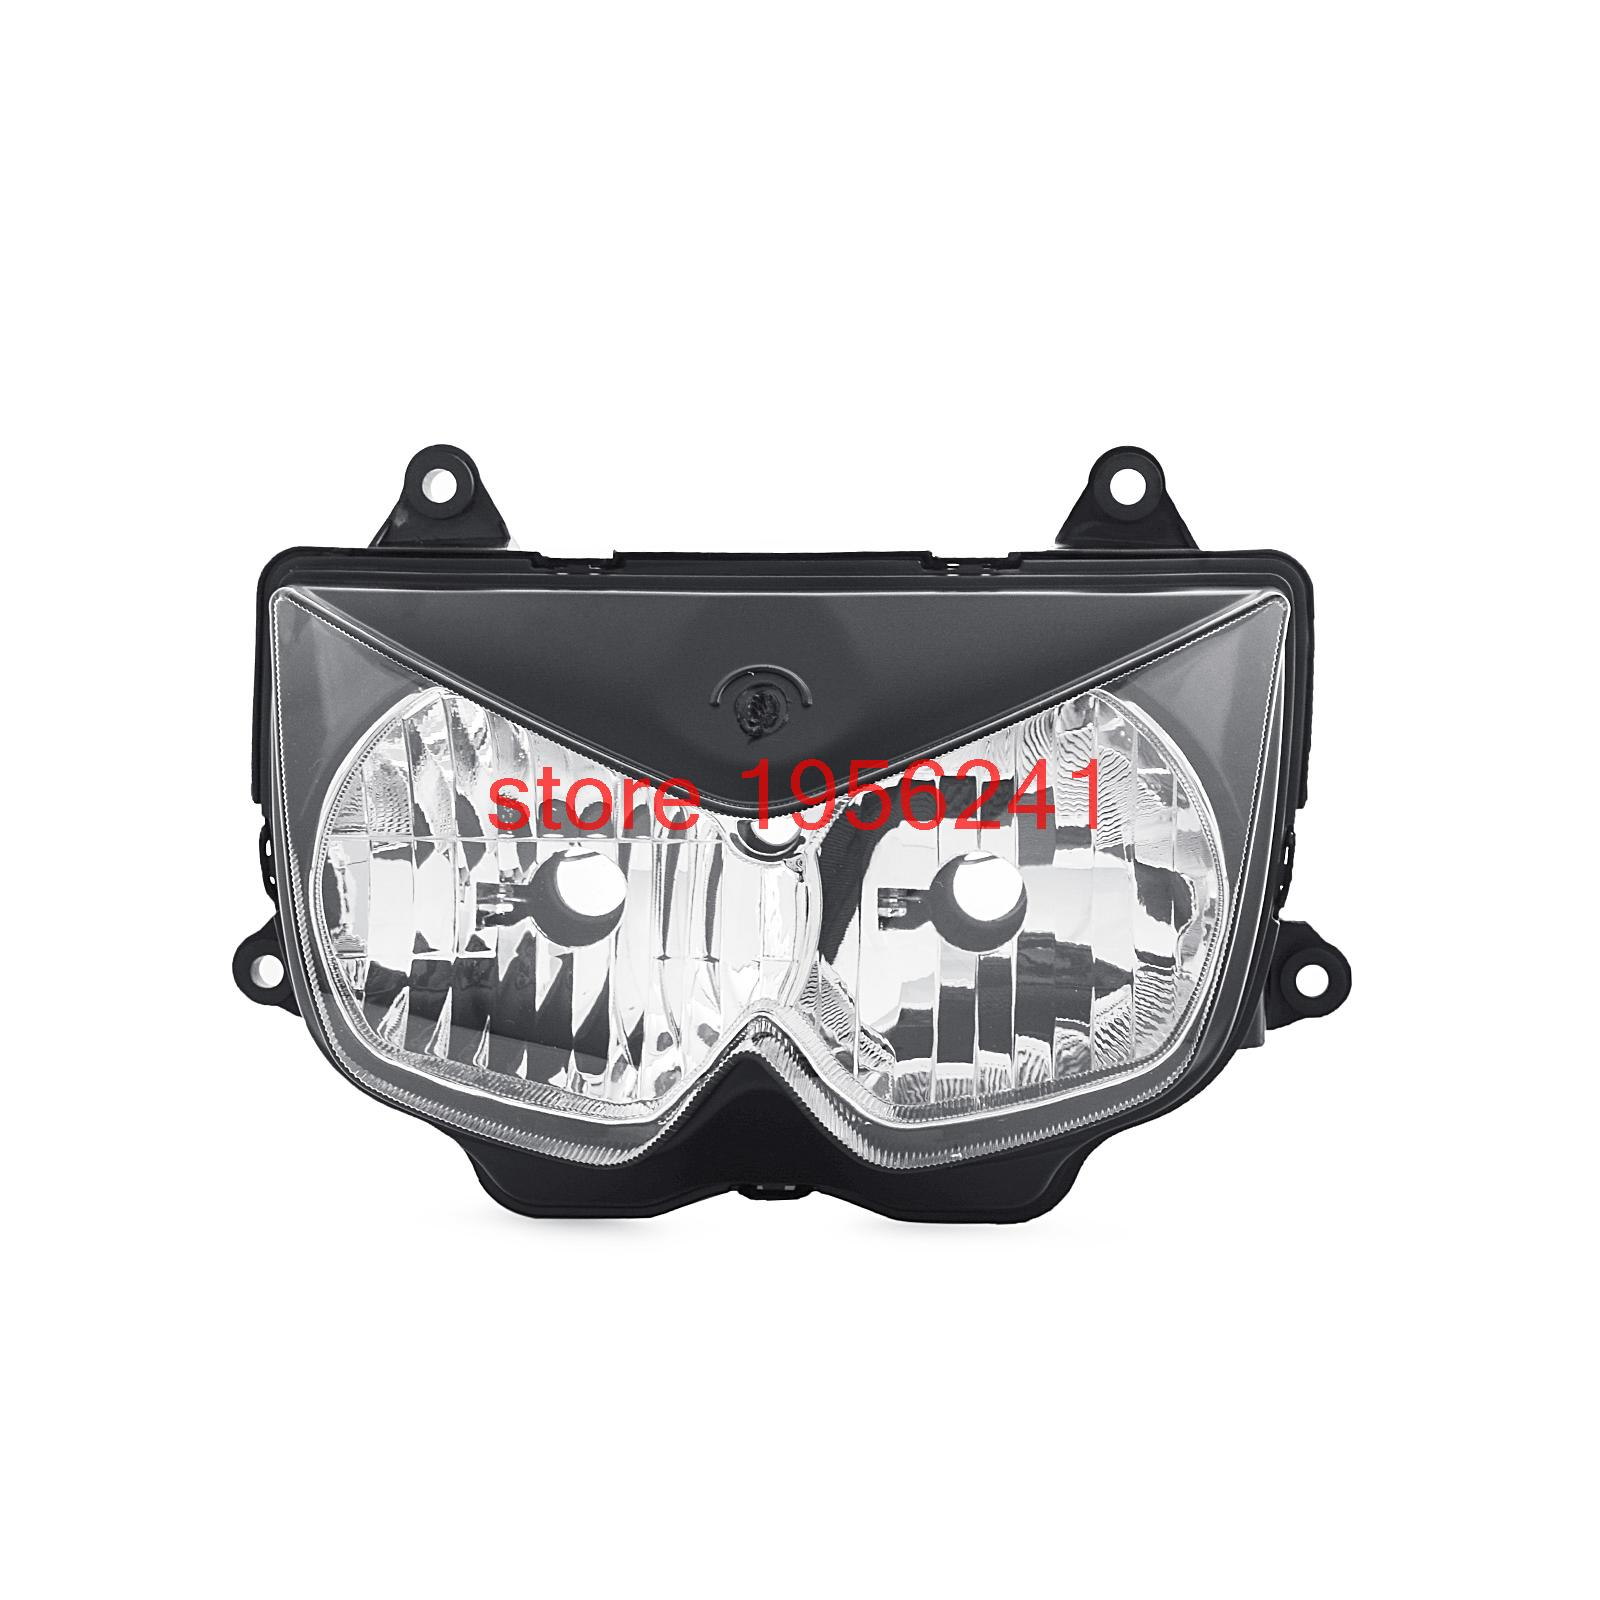 Motorcycle ABS Plastic Replacement  Headlight Headlamp Assembly Kit For Kawasaki Ninja 650R ER-6F ER6F 2006 2007 2008 ER 6F